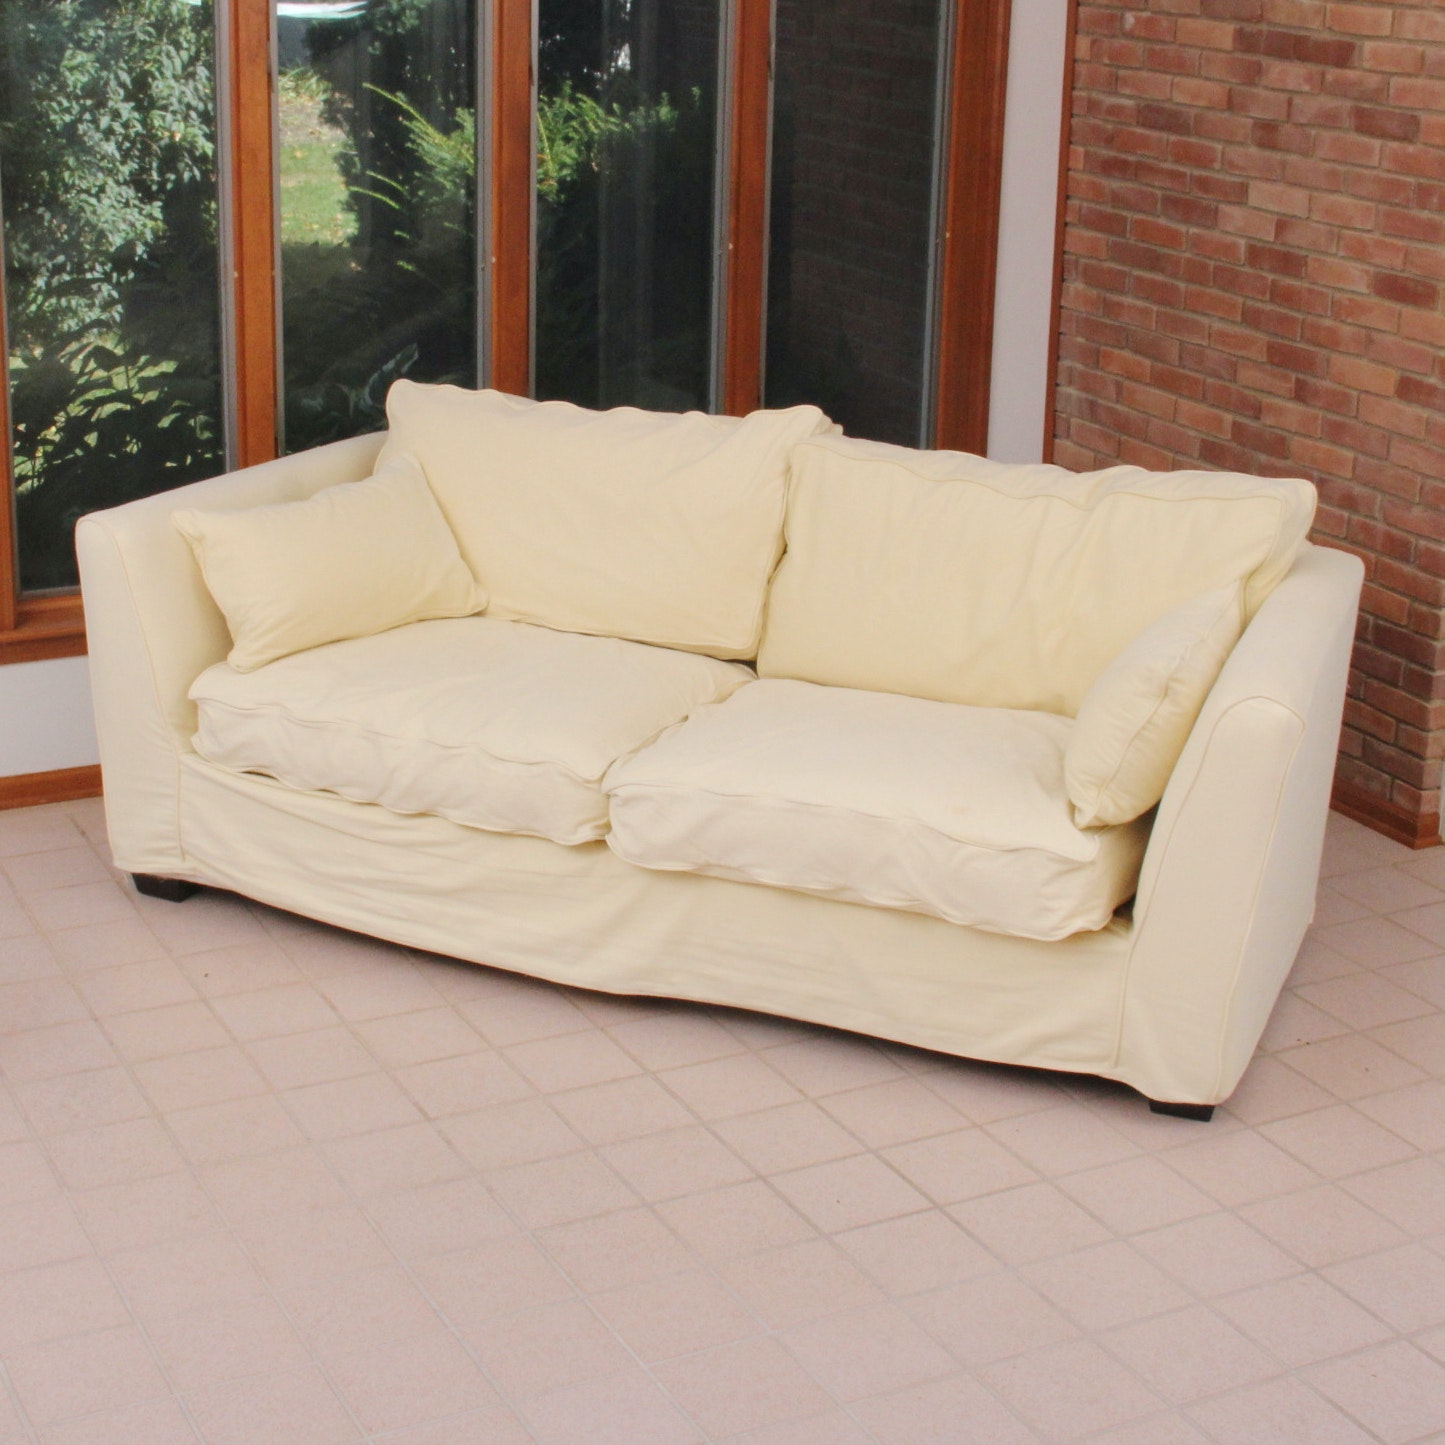 Upholstered Cream Sofa